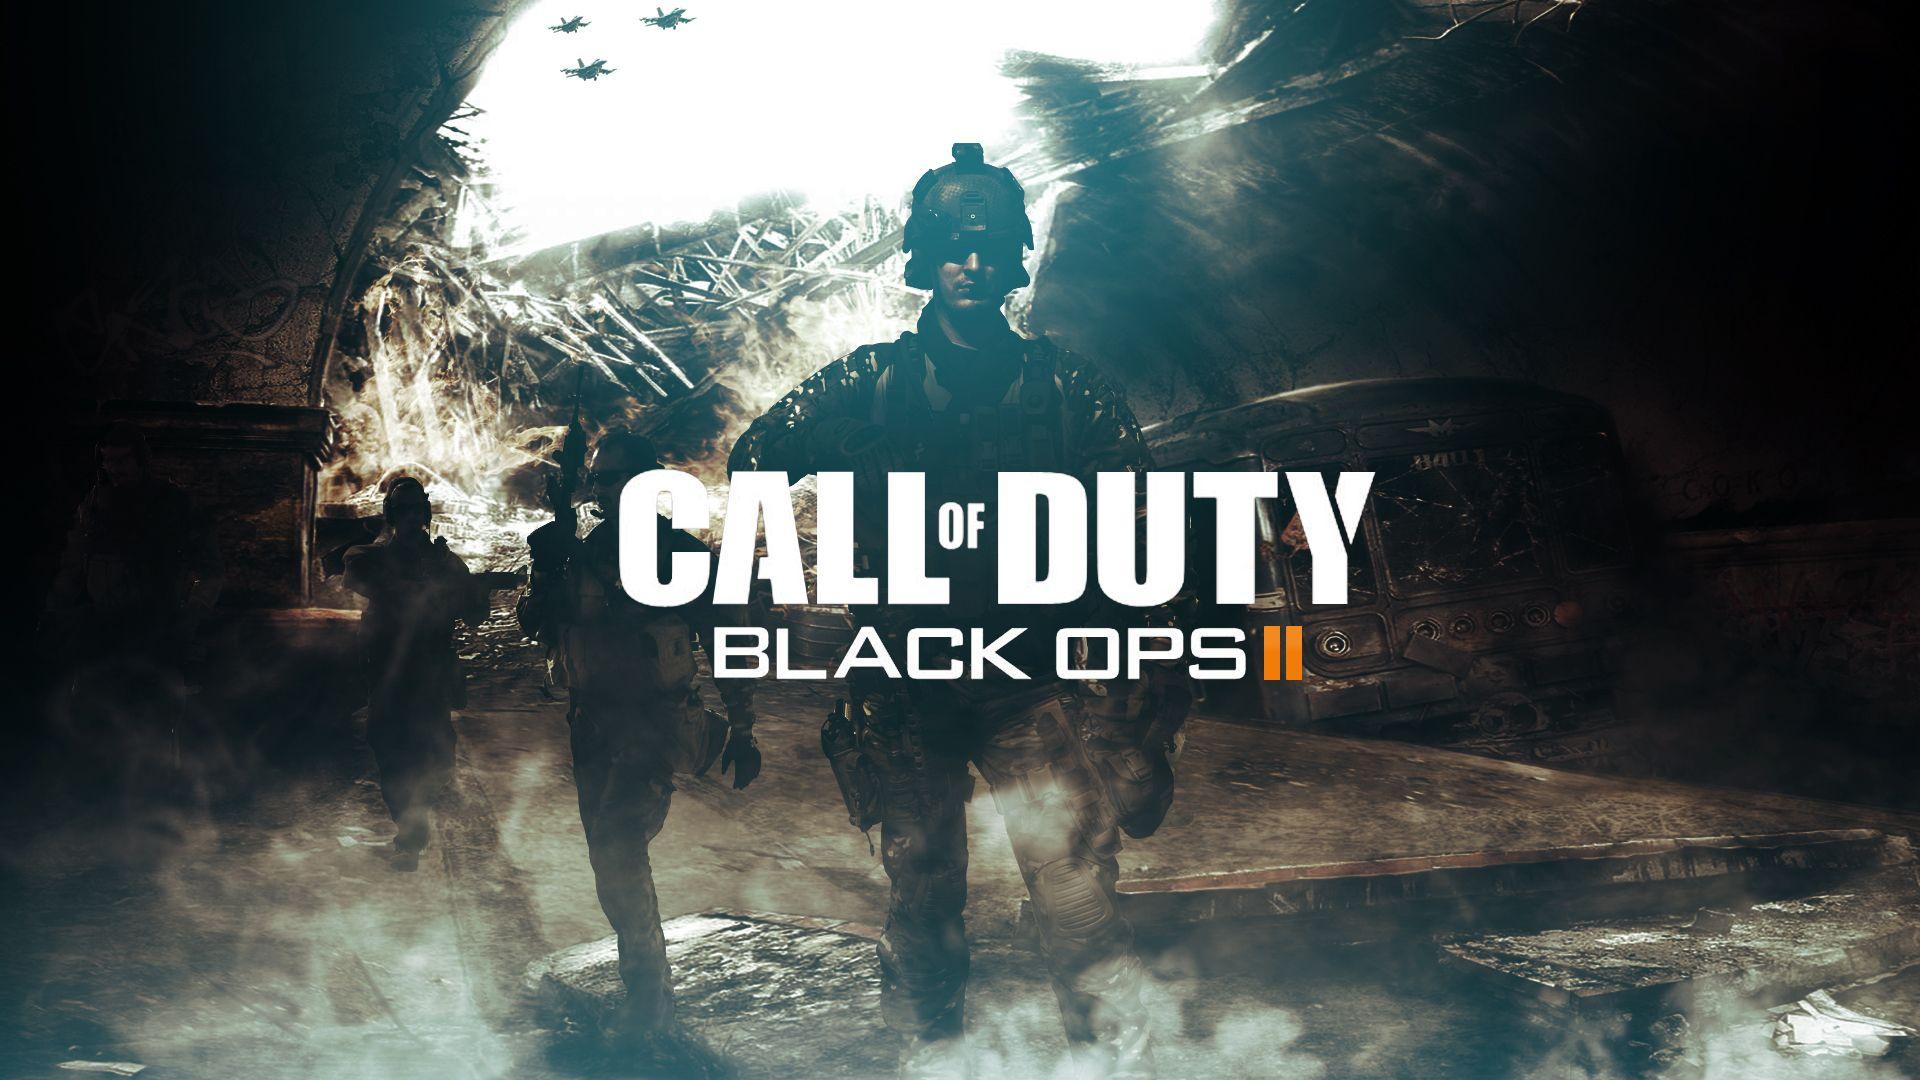 Call Of Duty Black Ops Ii Die Hard Scenario Wiki Fandom Powered